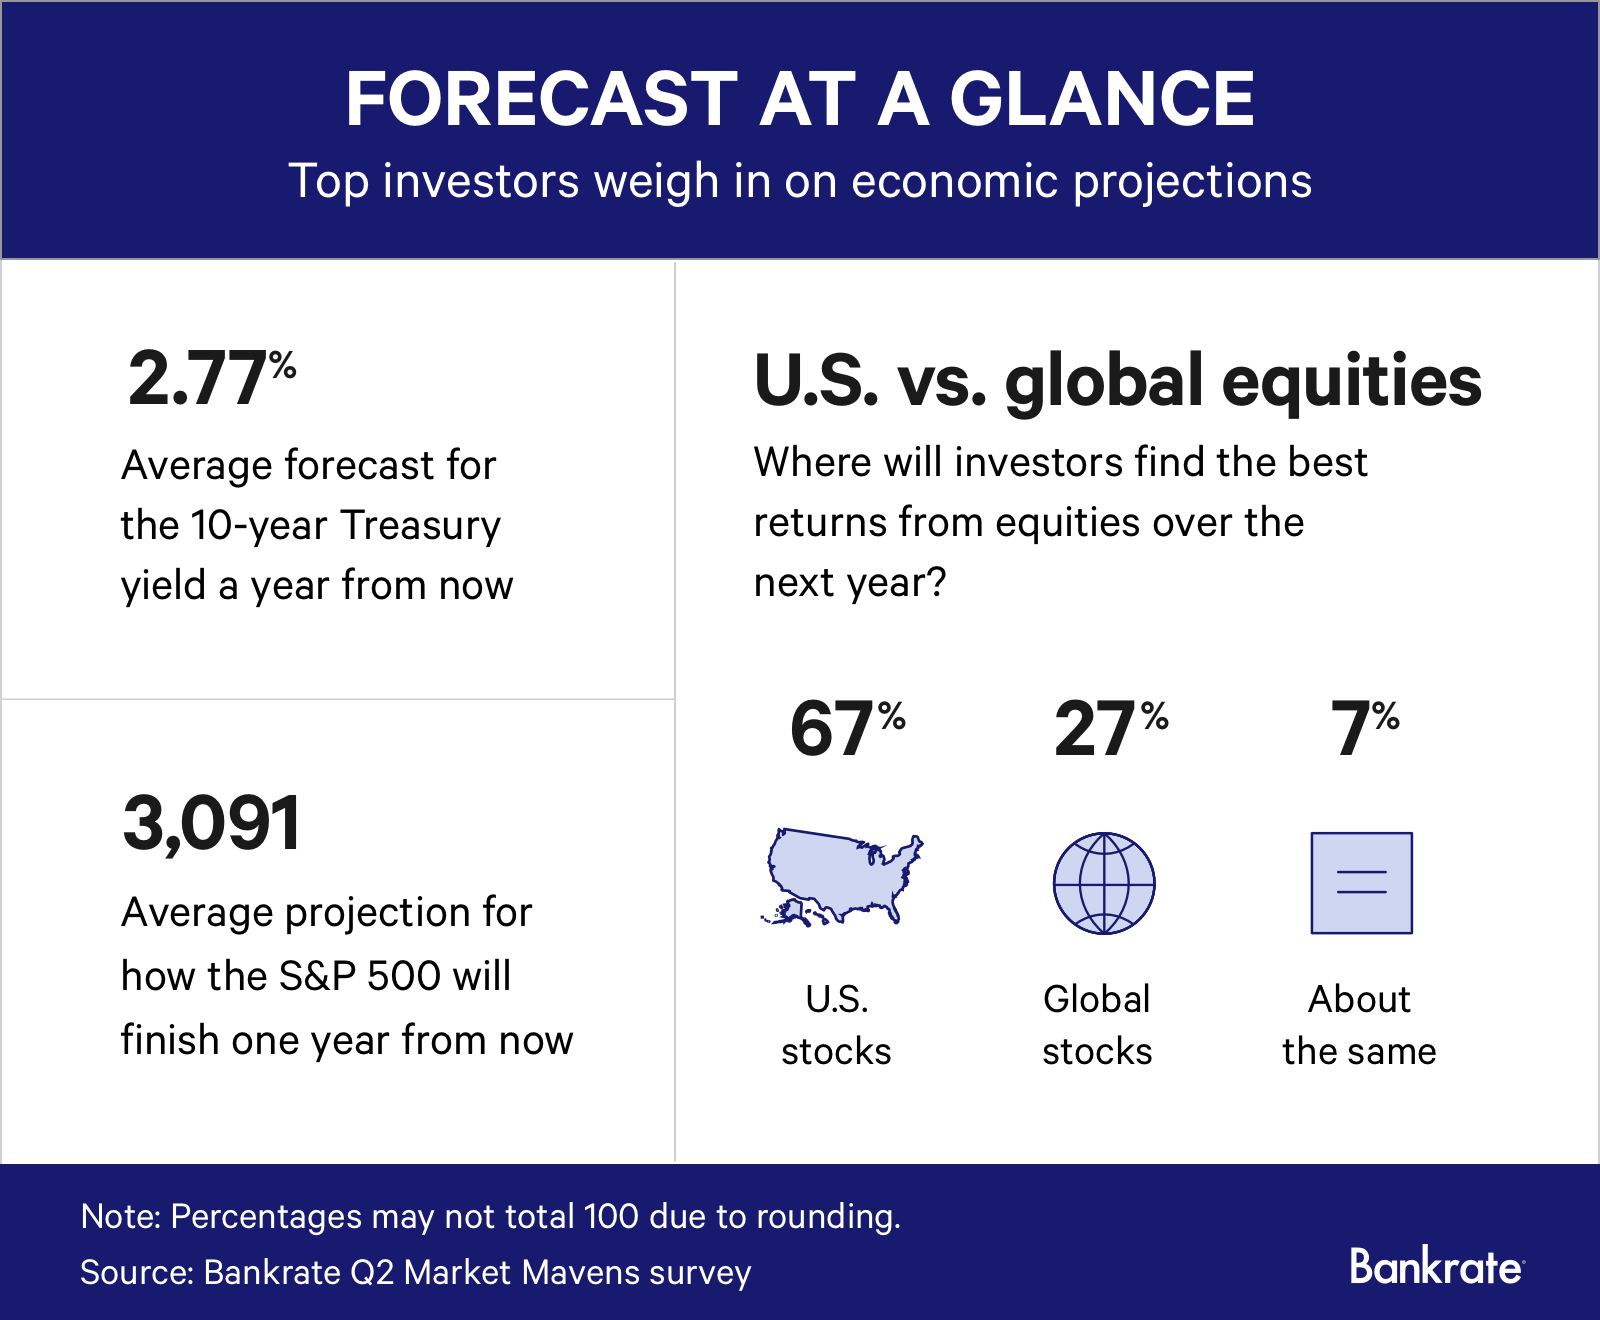 Economic projections for quarter 2